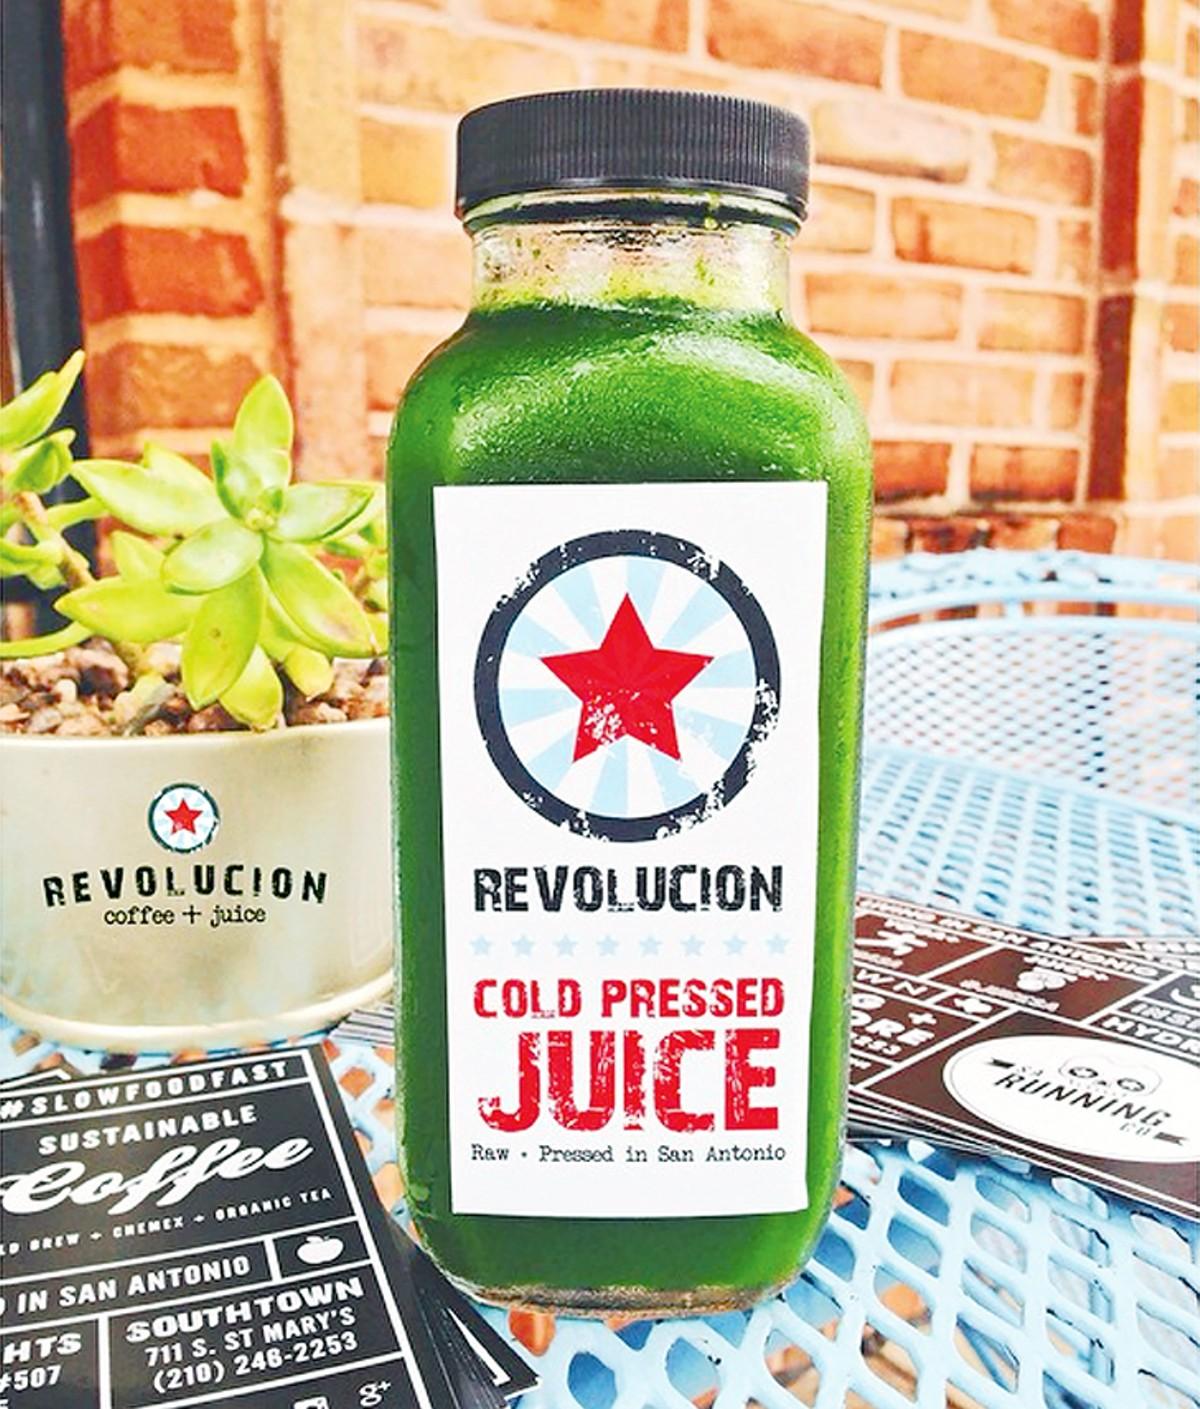 revolucion_juice_shop_2.jpg